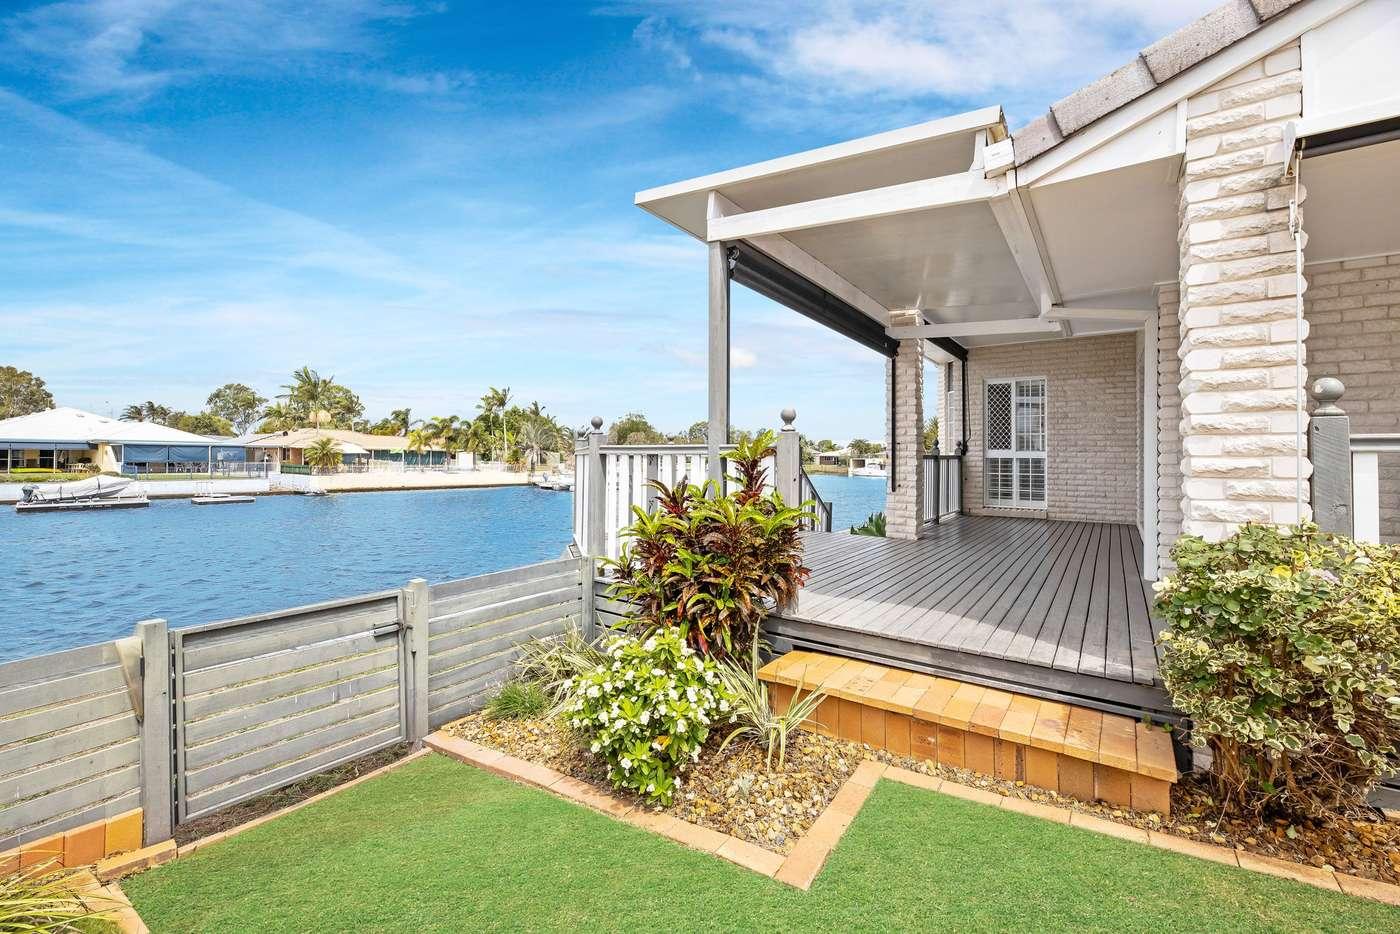 Main view of Homely house listing, 48 Jacaranda Drive, Bongaree QLD 4507